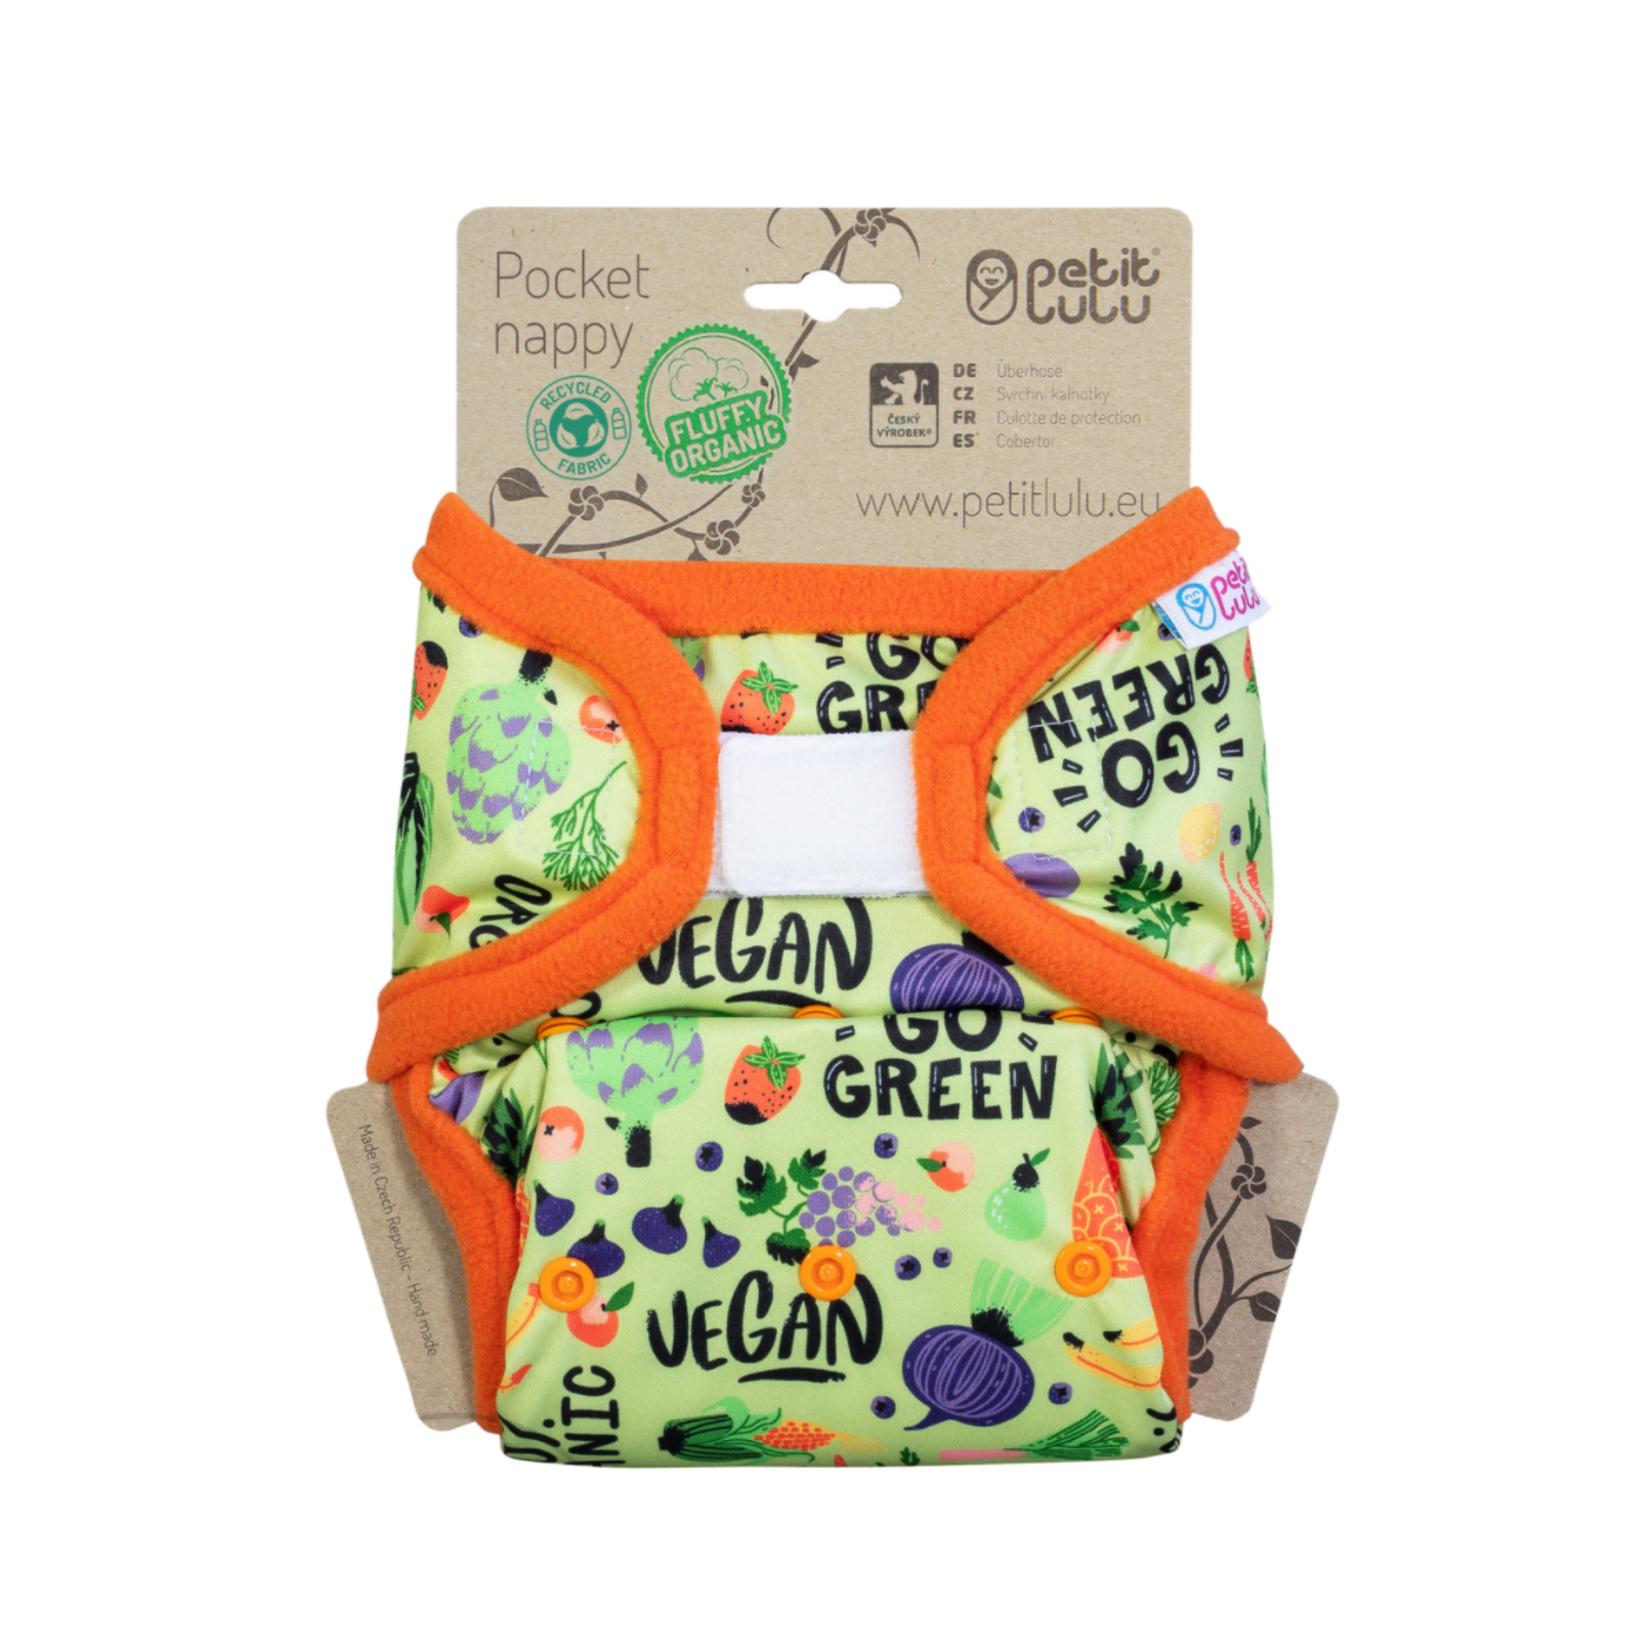 Petit Lulu Pocketluier (Go Green) Velcro